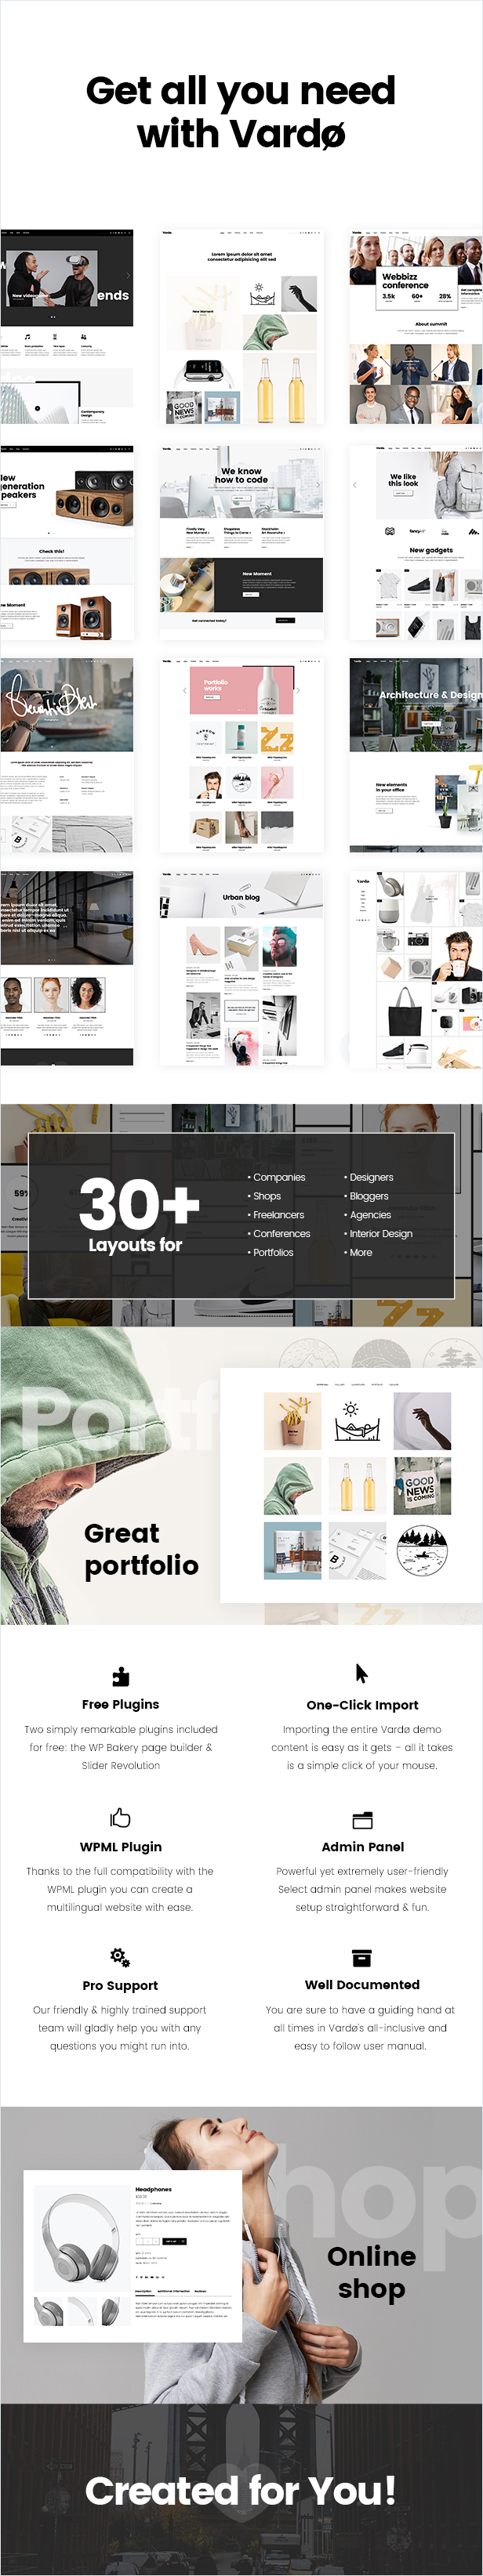 Vardø - Creative Design Portfolio Theme - 1